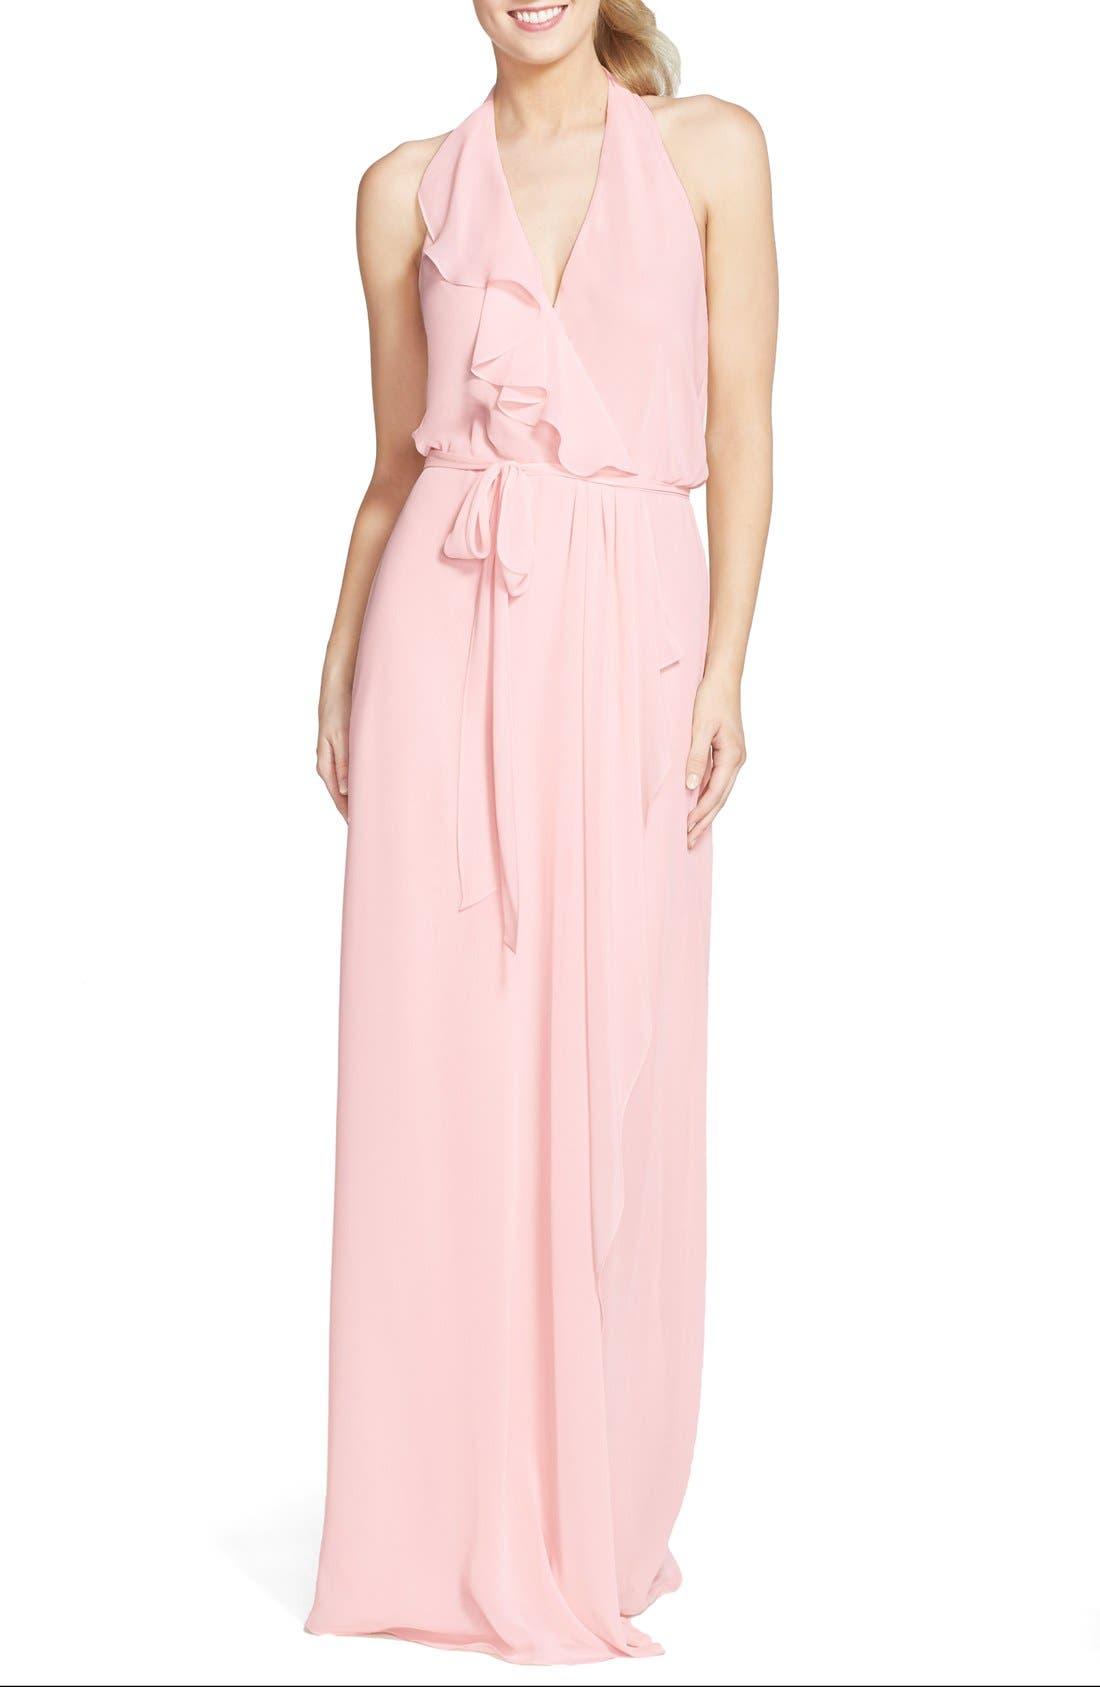 'Erica' Ruffle Chiffon Halter Neck Wrap Gown,                         Main,                         color, Peony